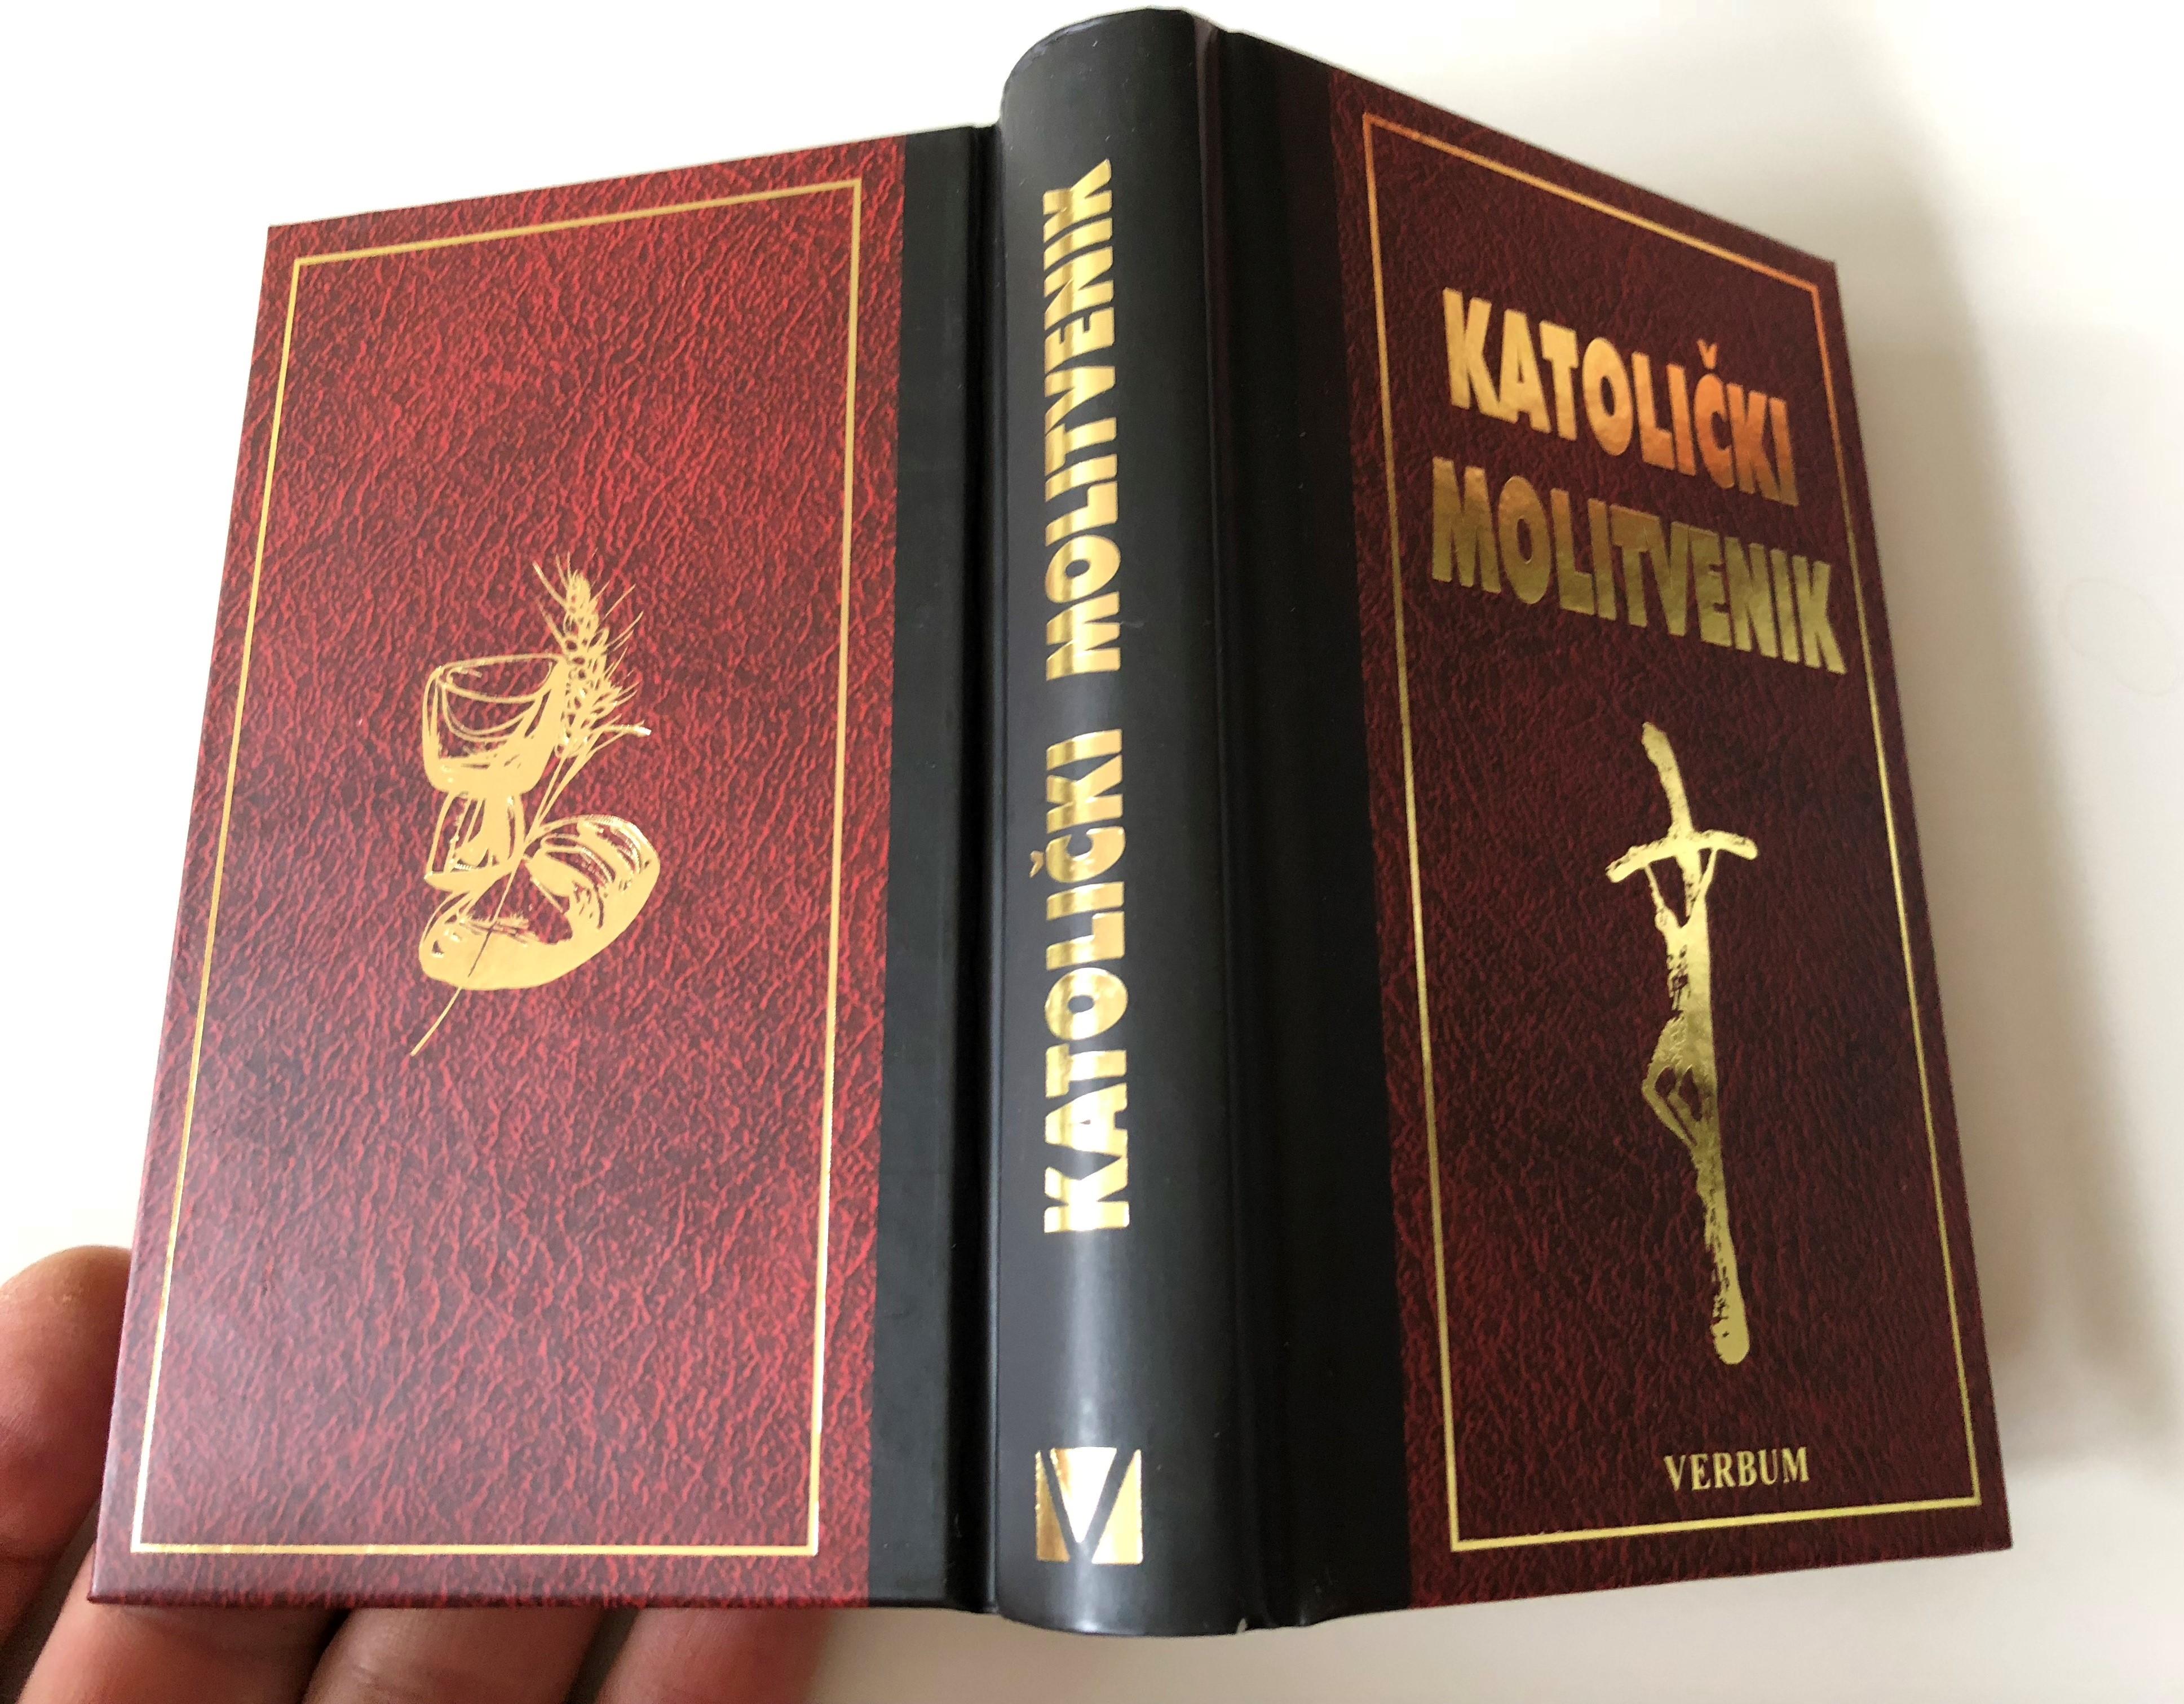 croatian-small-catholic-prayer-book-11th-ed-2.jpg